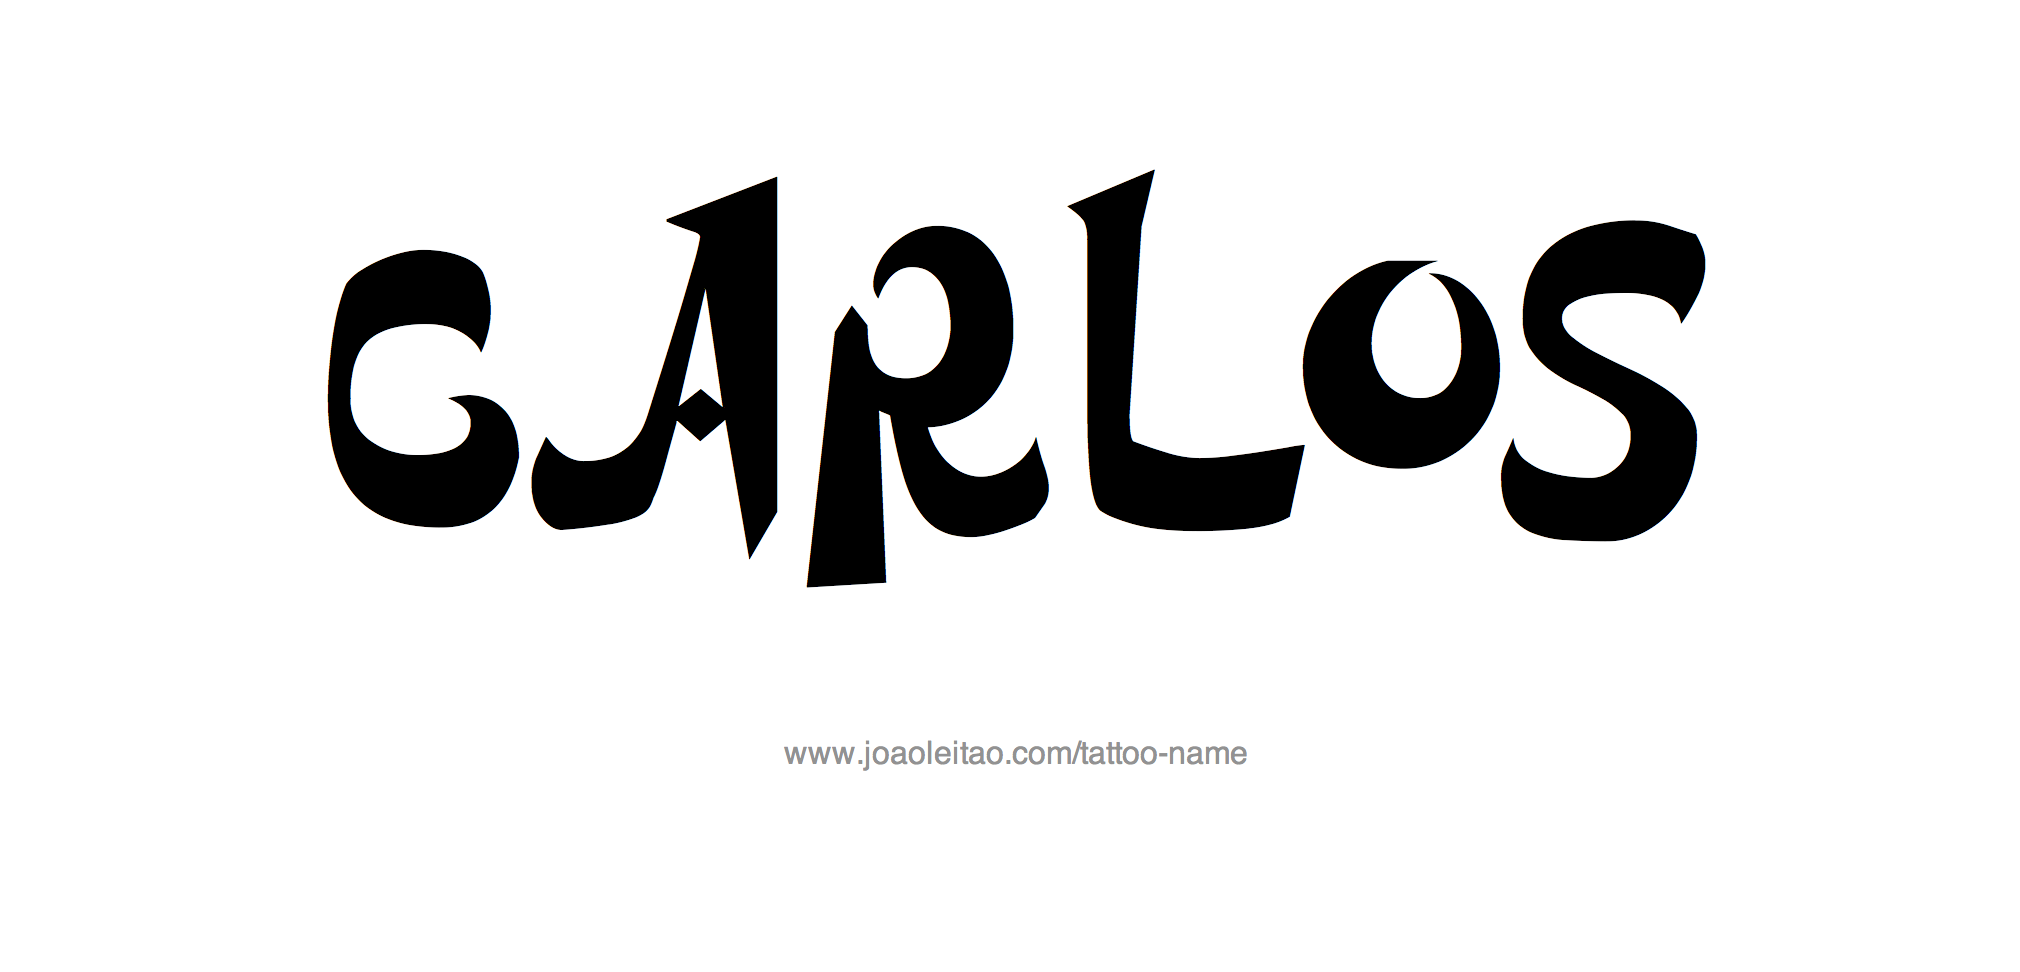 Name: Carlos Name Tattoo Designs